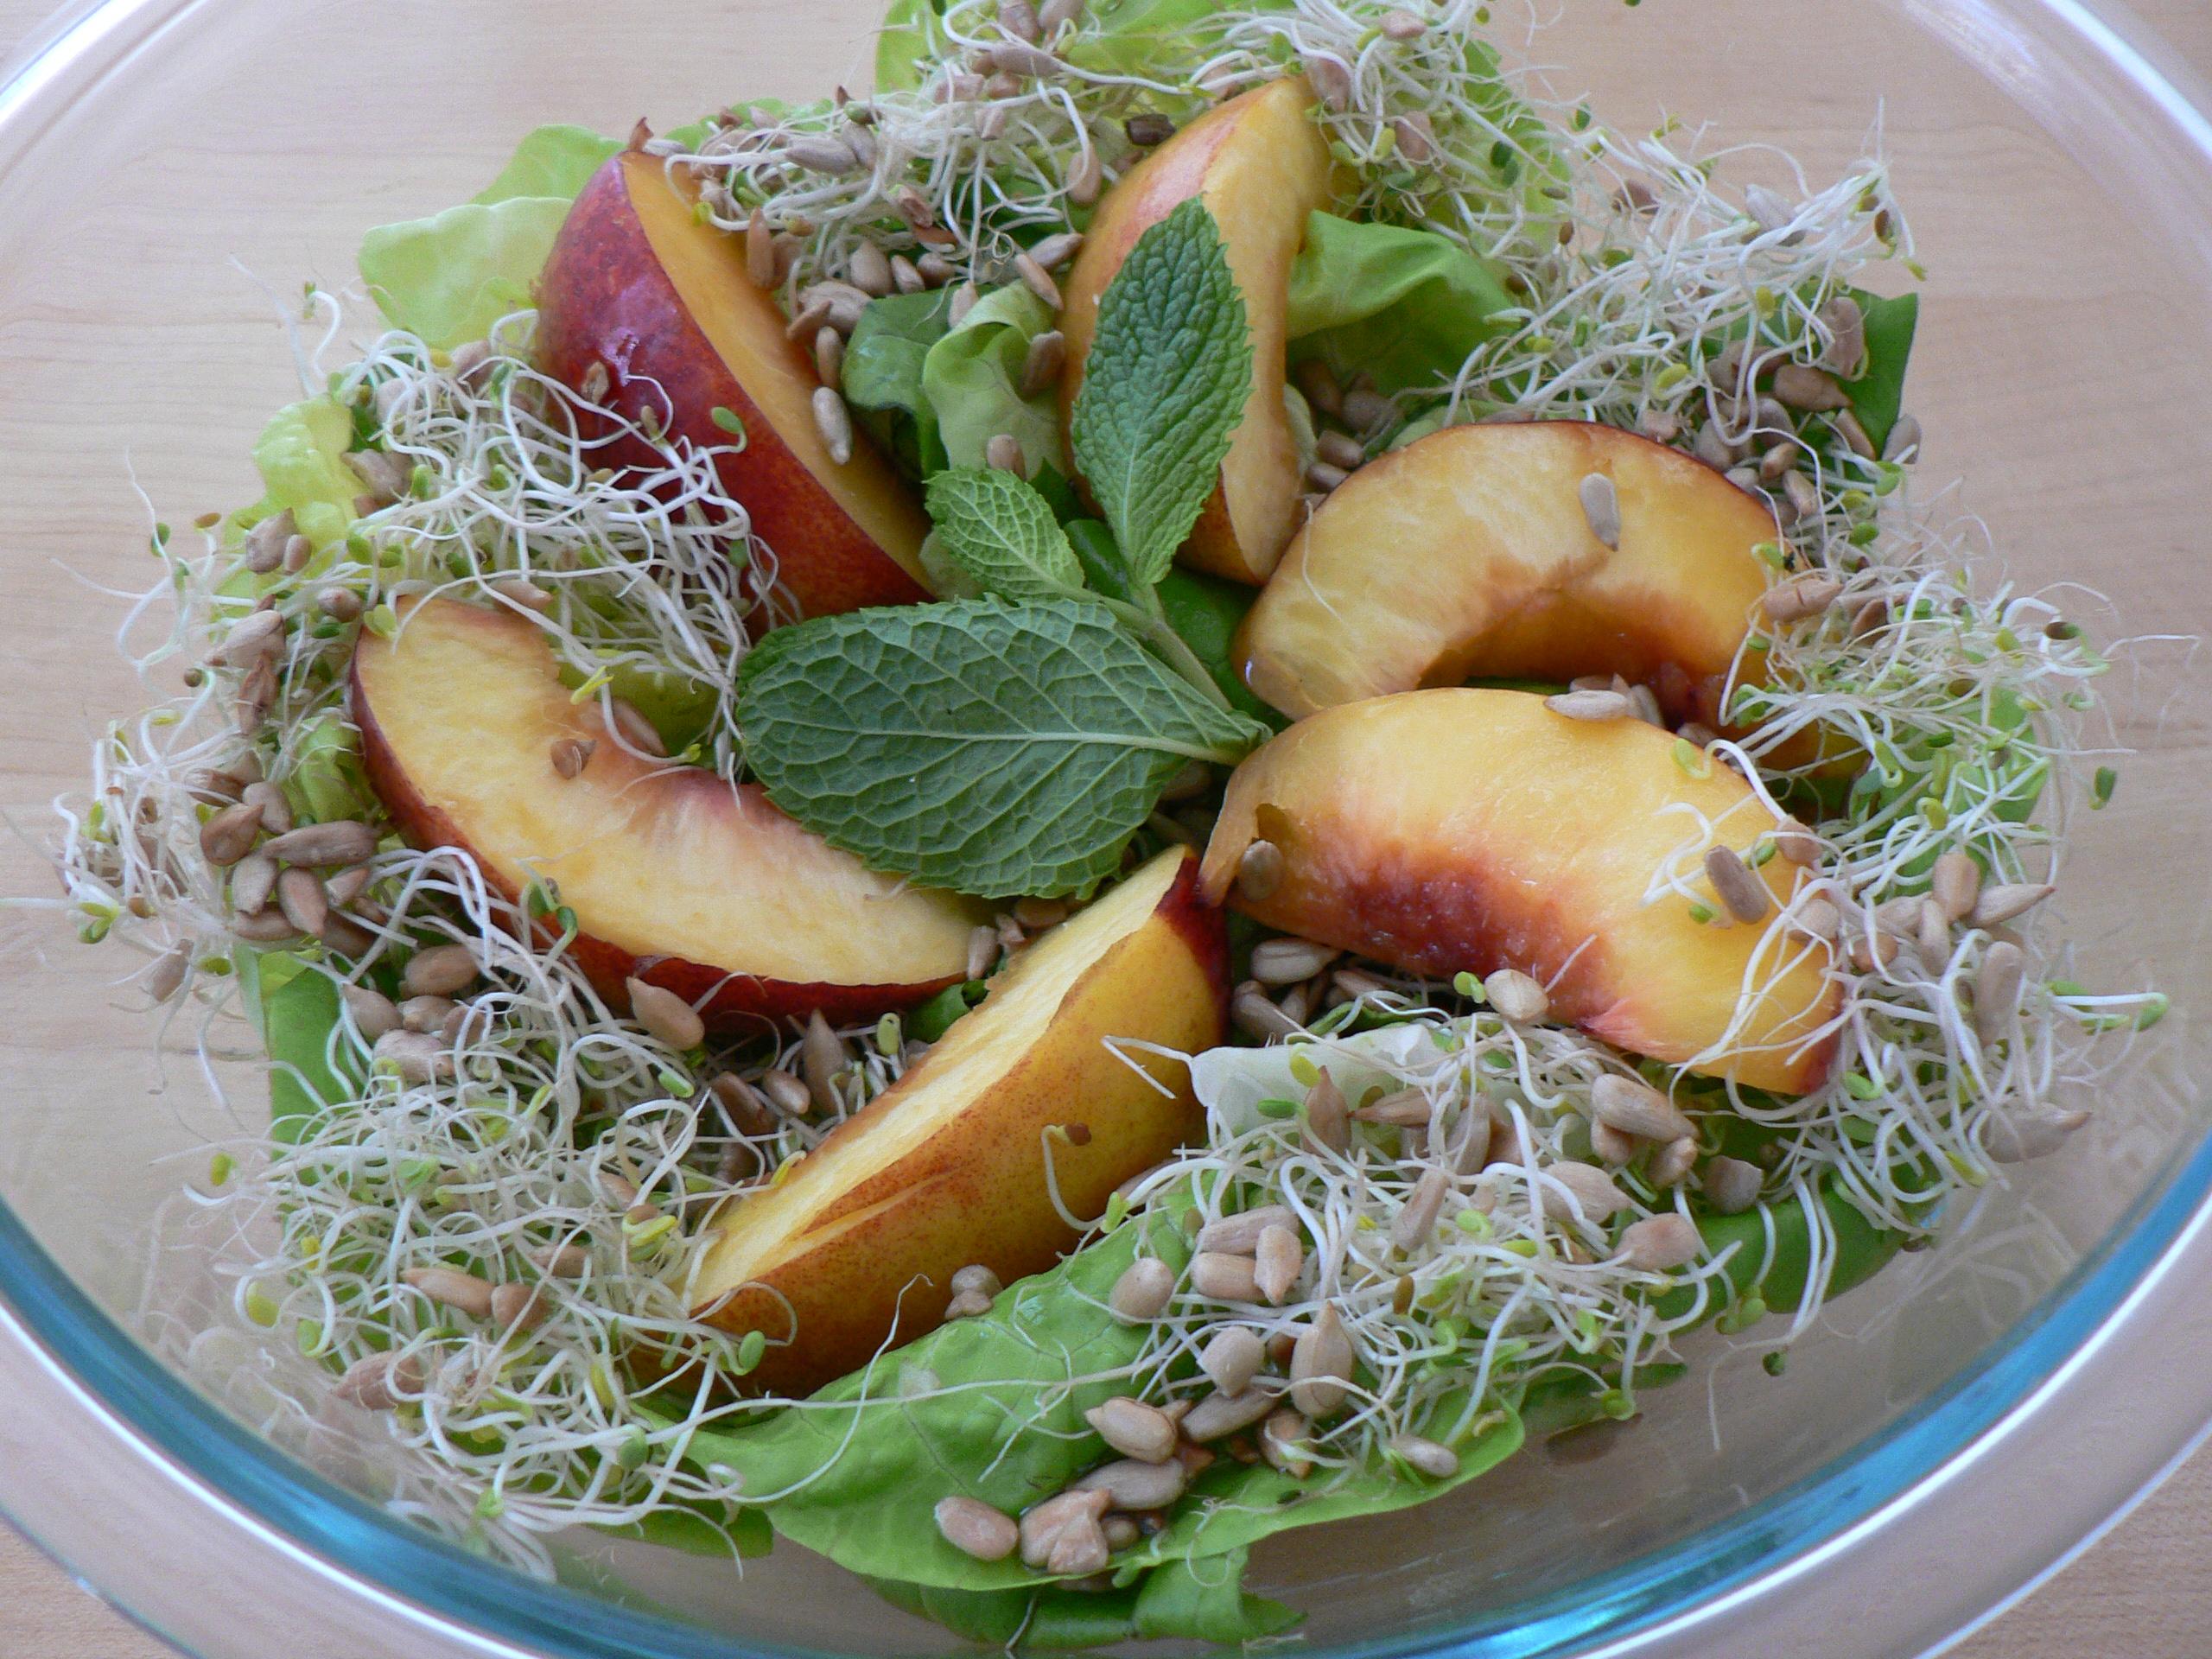 Stellar Vegan Salad with Roasted Nectarines